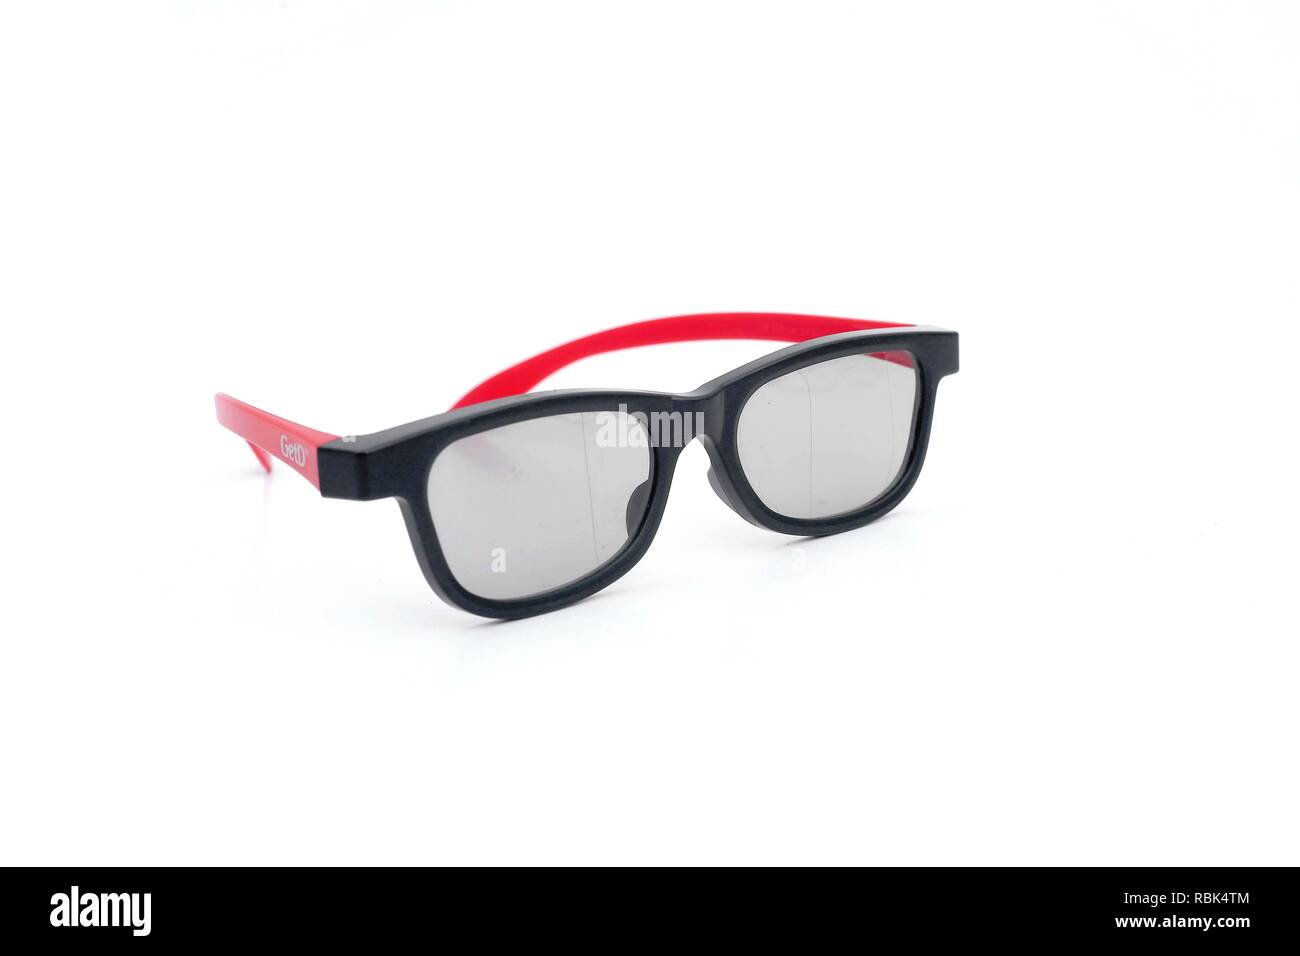 Photo Of Eye Glasses Isolated On The White Background Stock